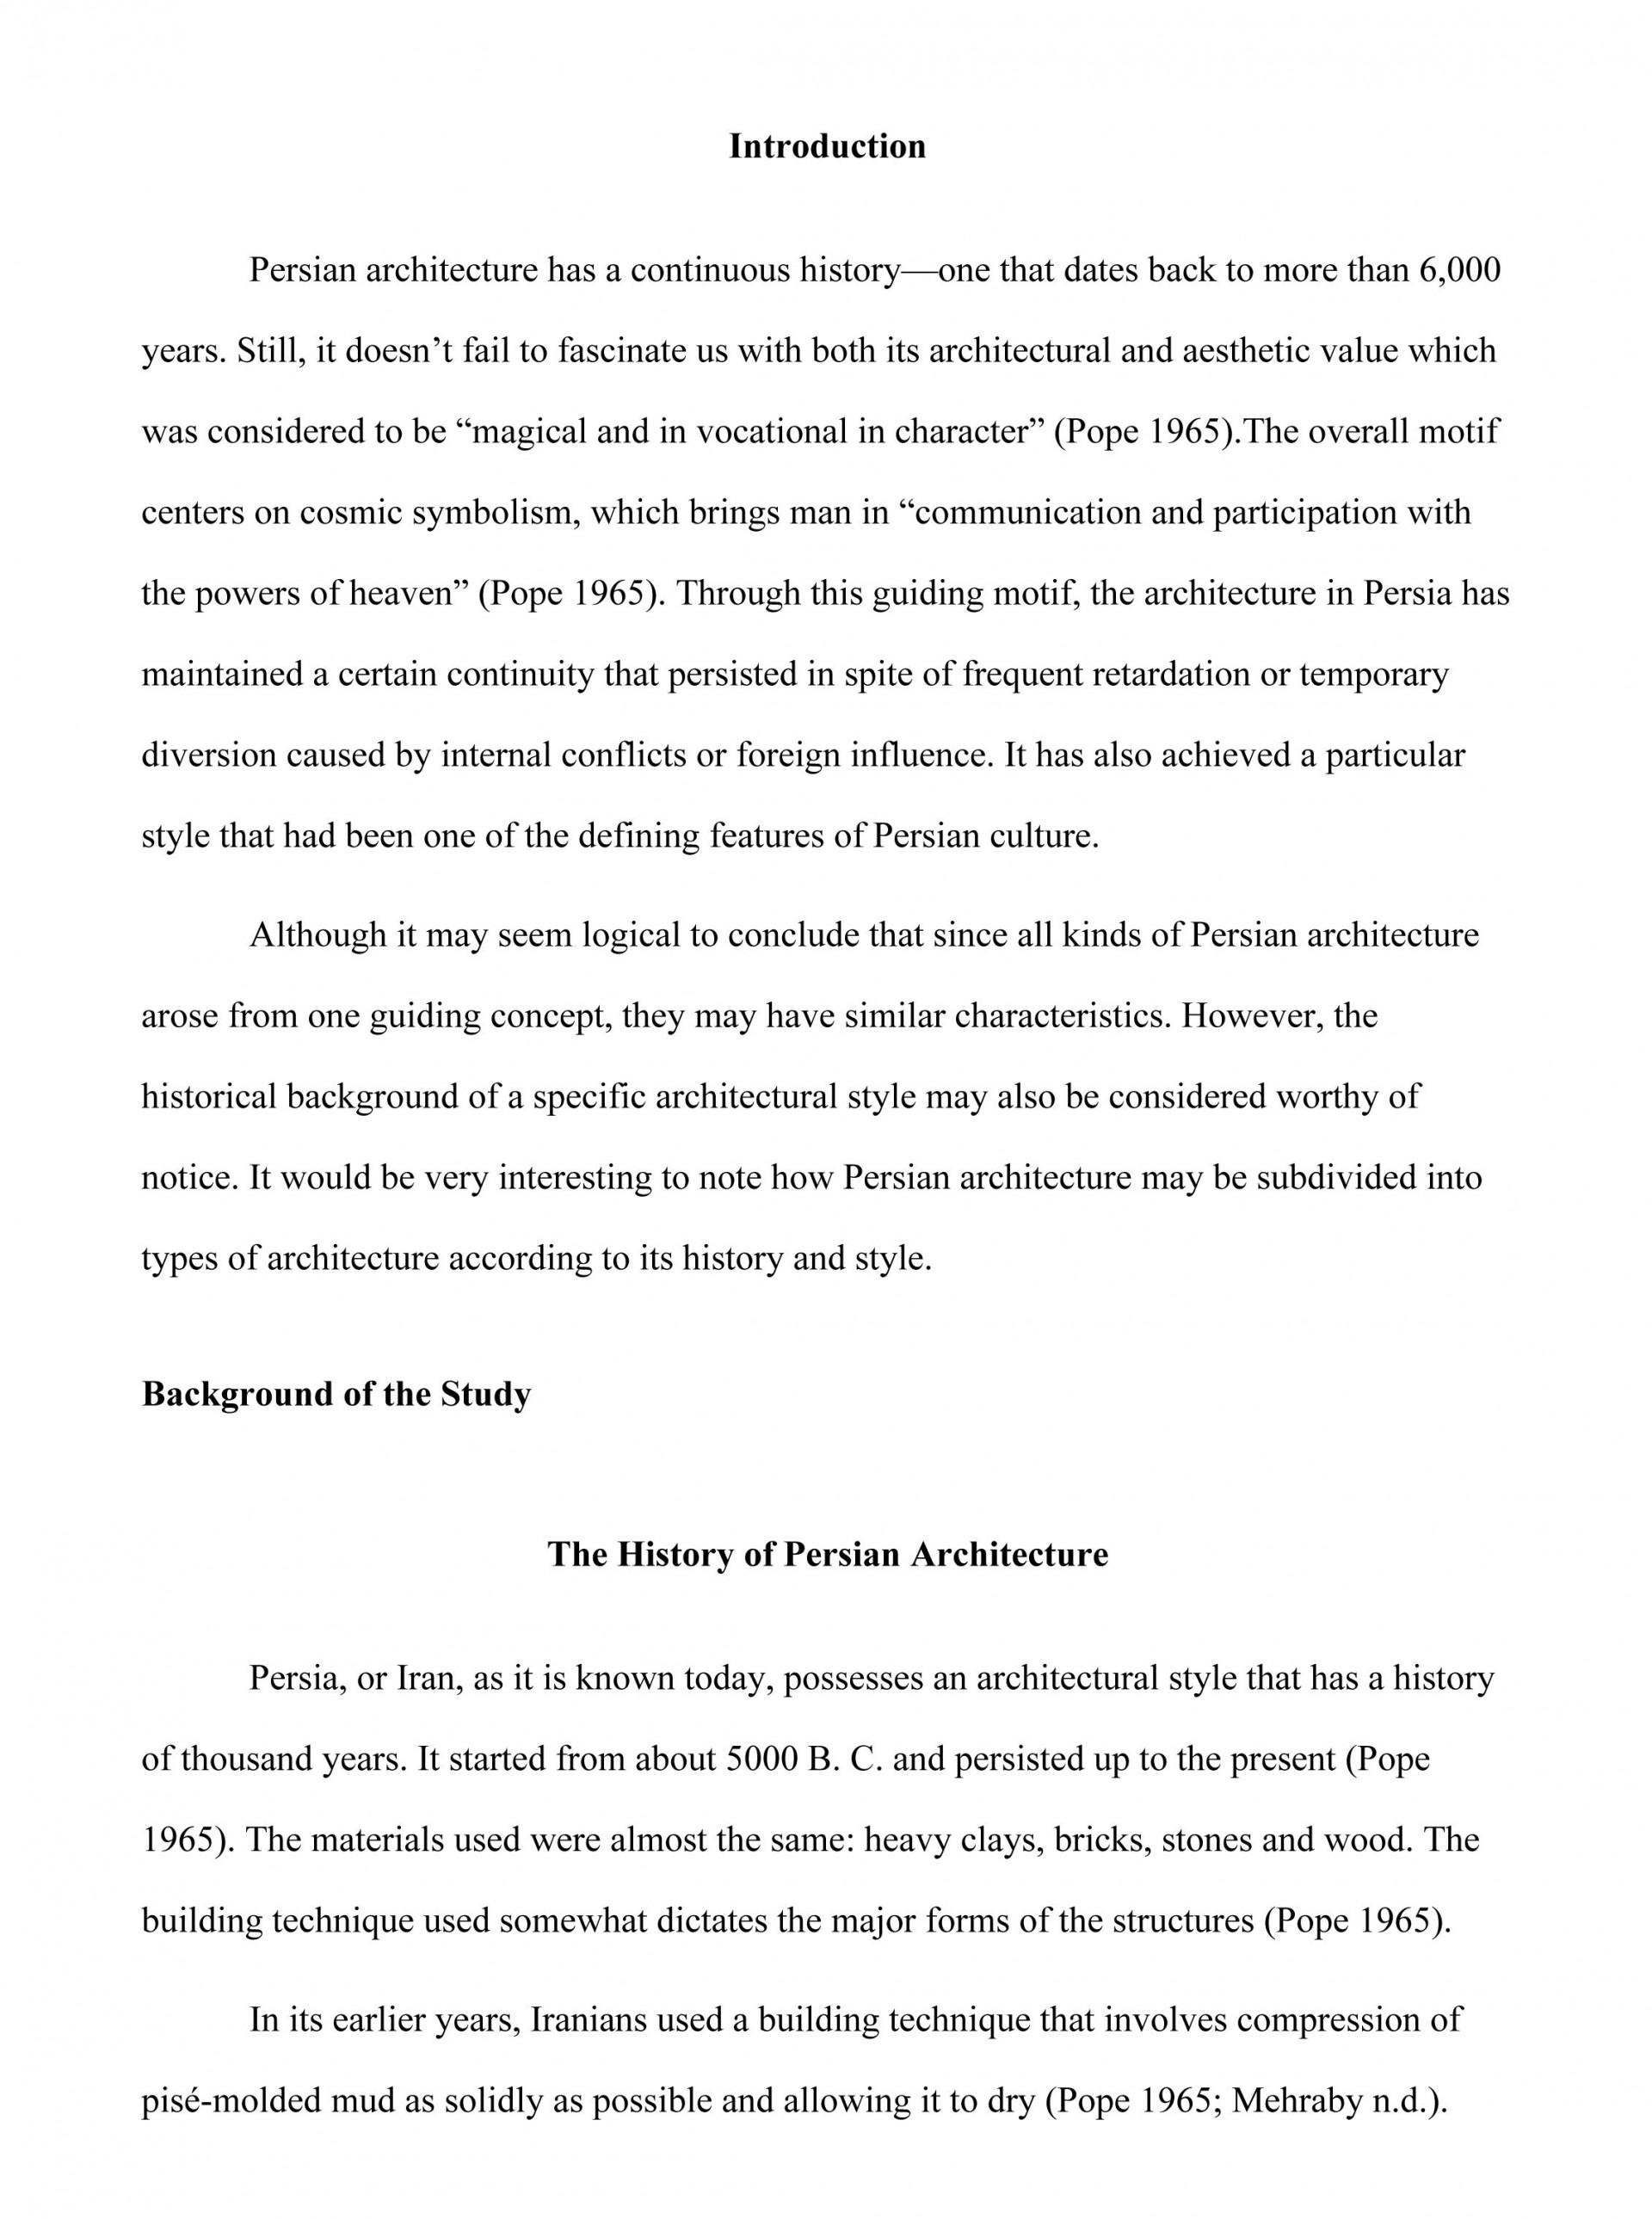 007 Hurricane Essay Example Rare Conclusion Sandy Katrina 1920